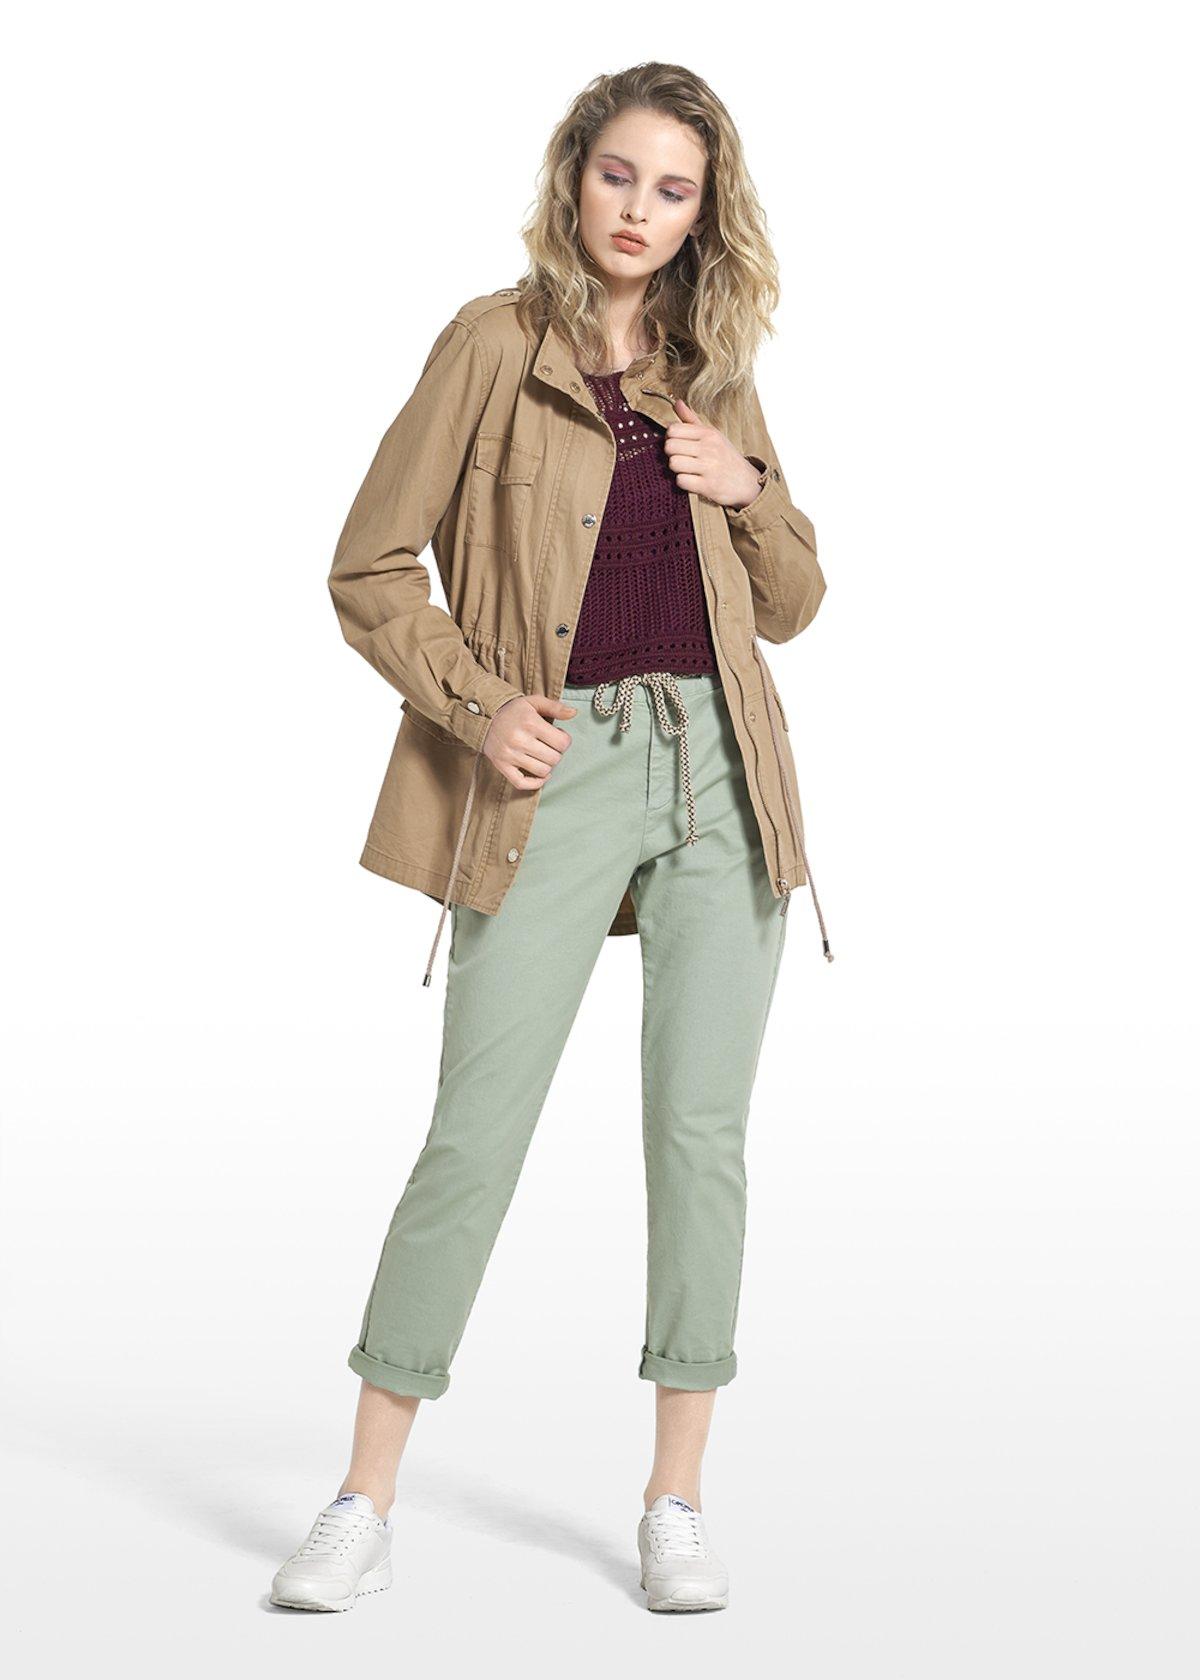 Gayl jacket Saharan model with metallic details - Tobacco - Woman